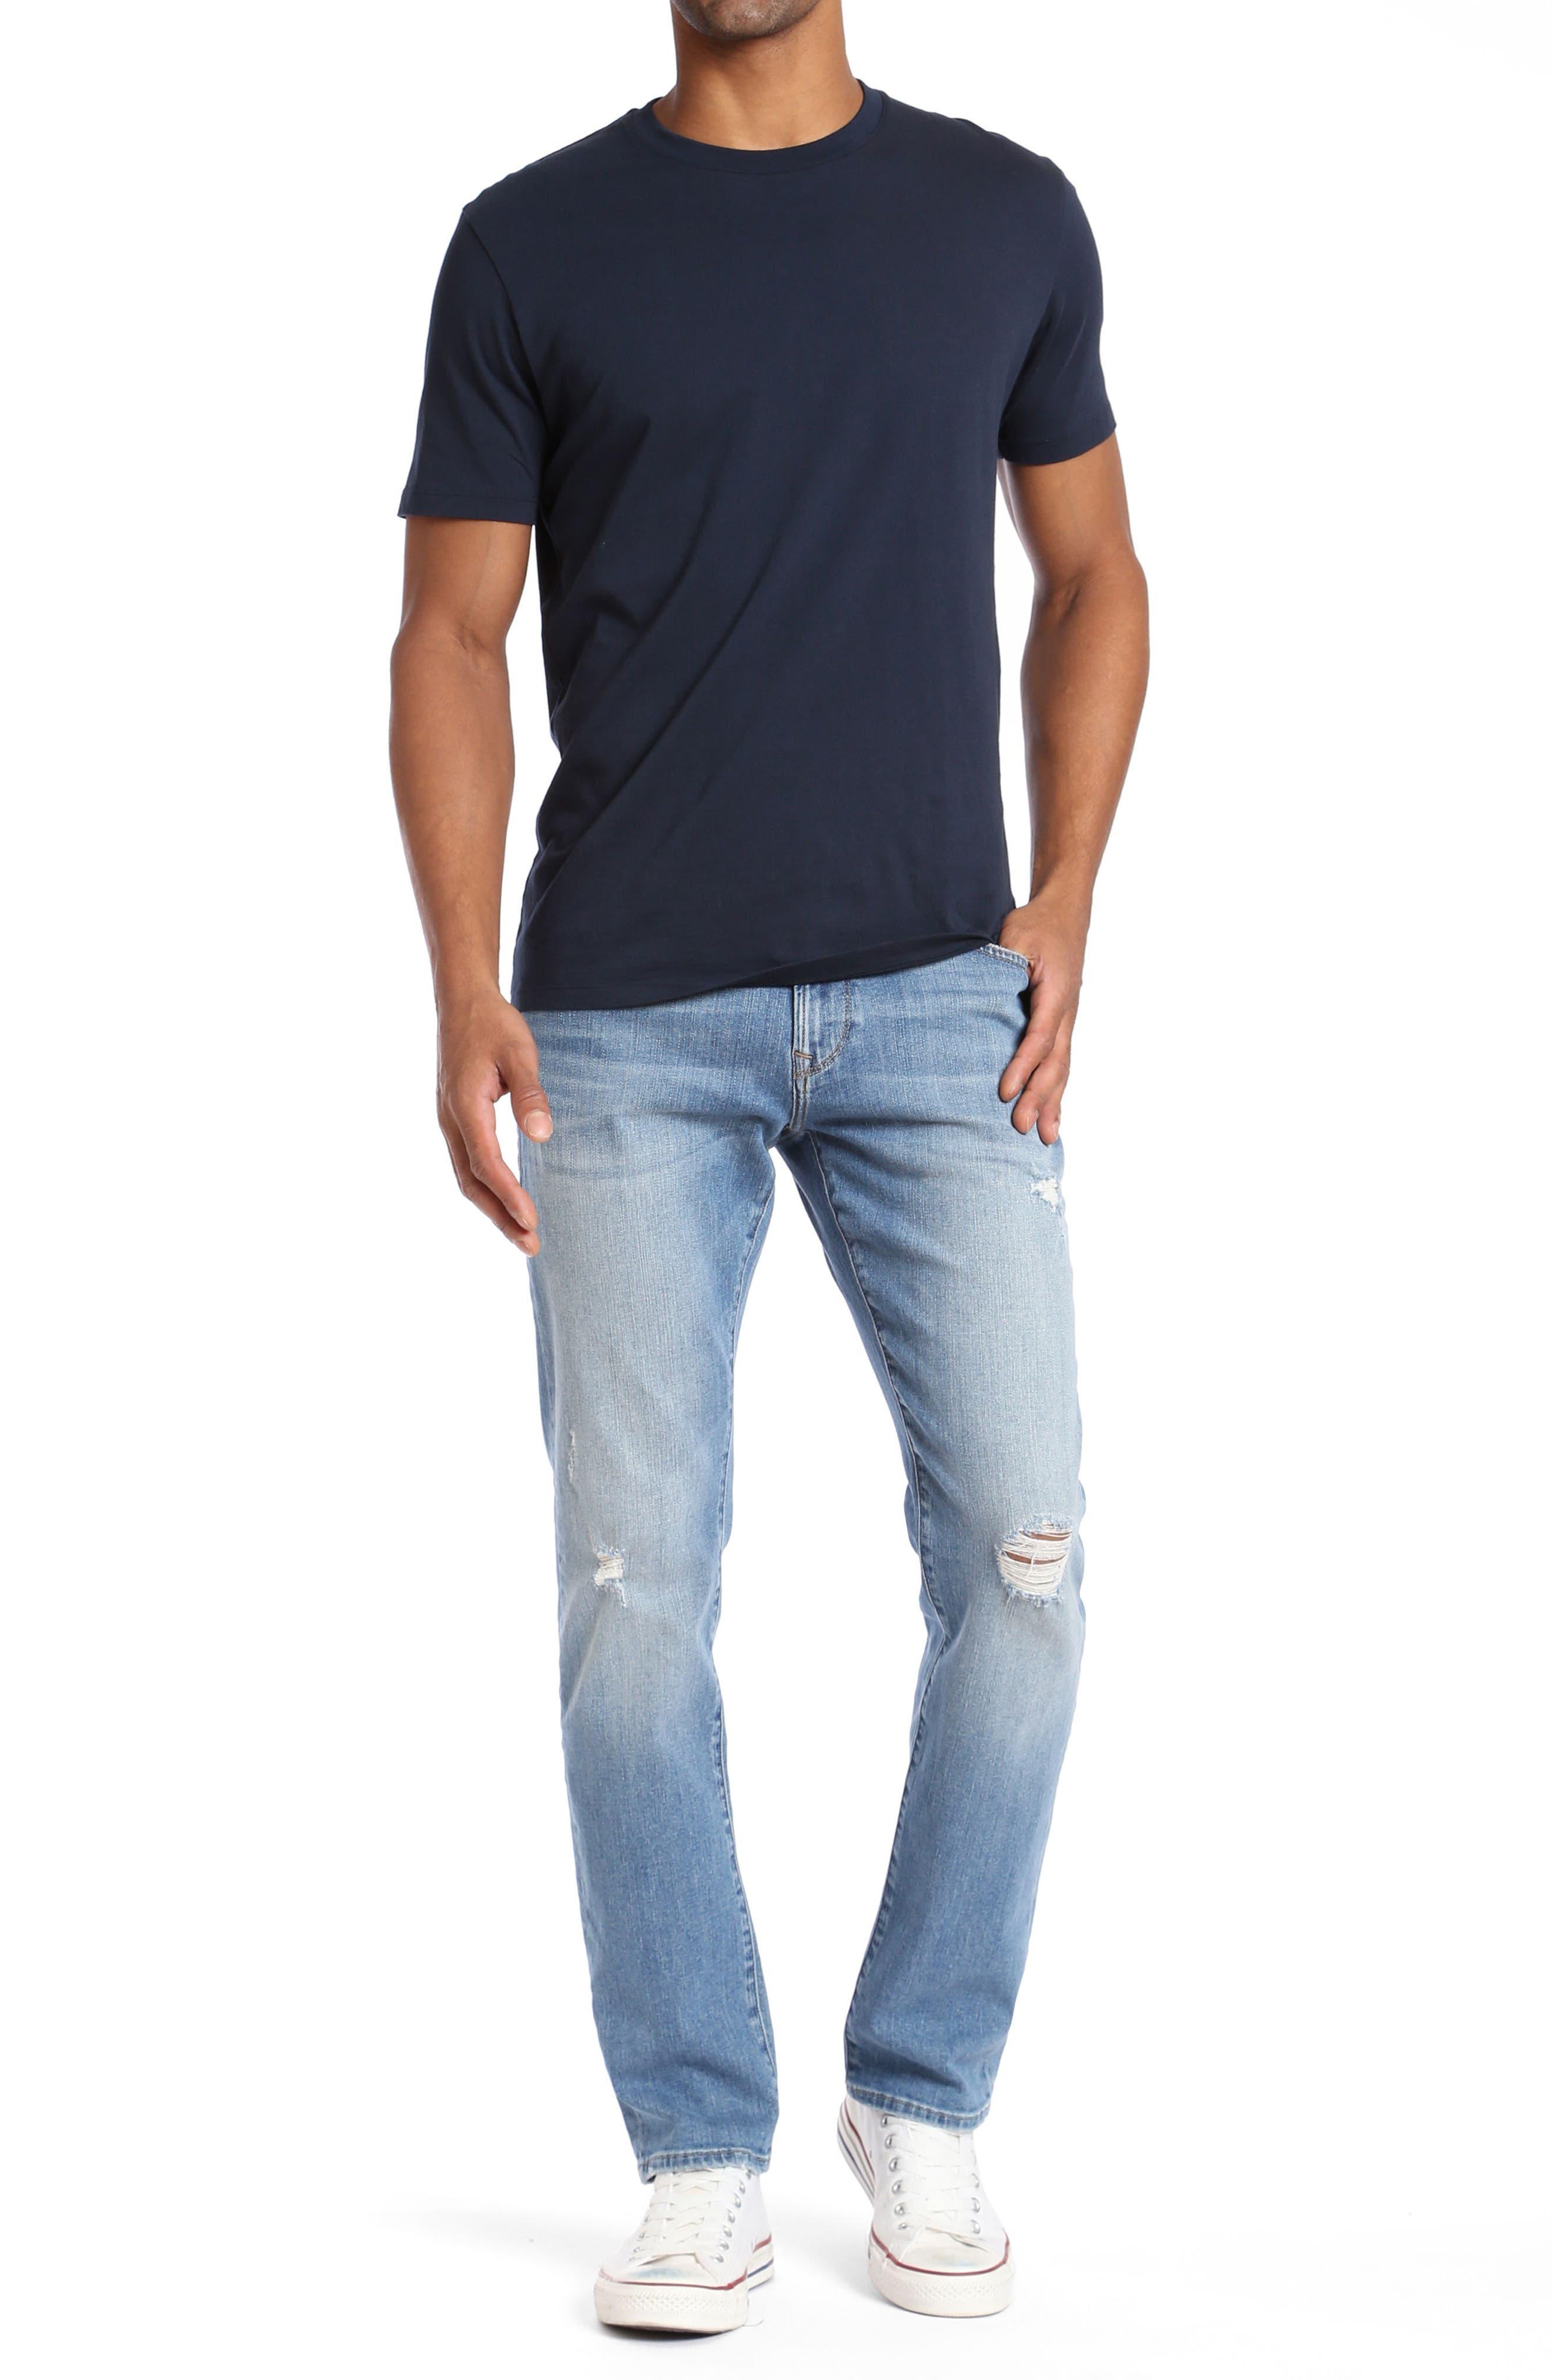 Jake Slim Fit Jeans,                             Alternate thumbnail 4, color,                             420